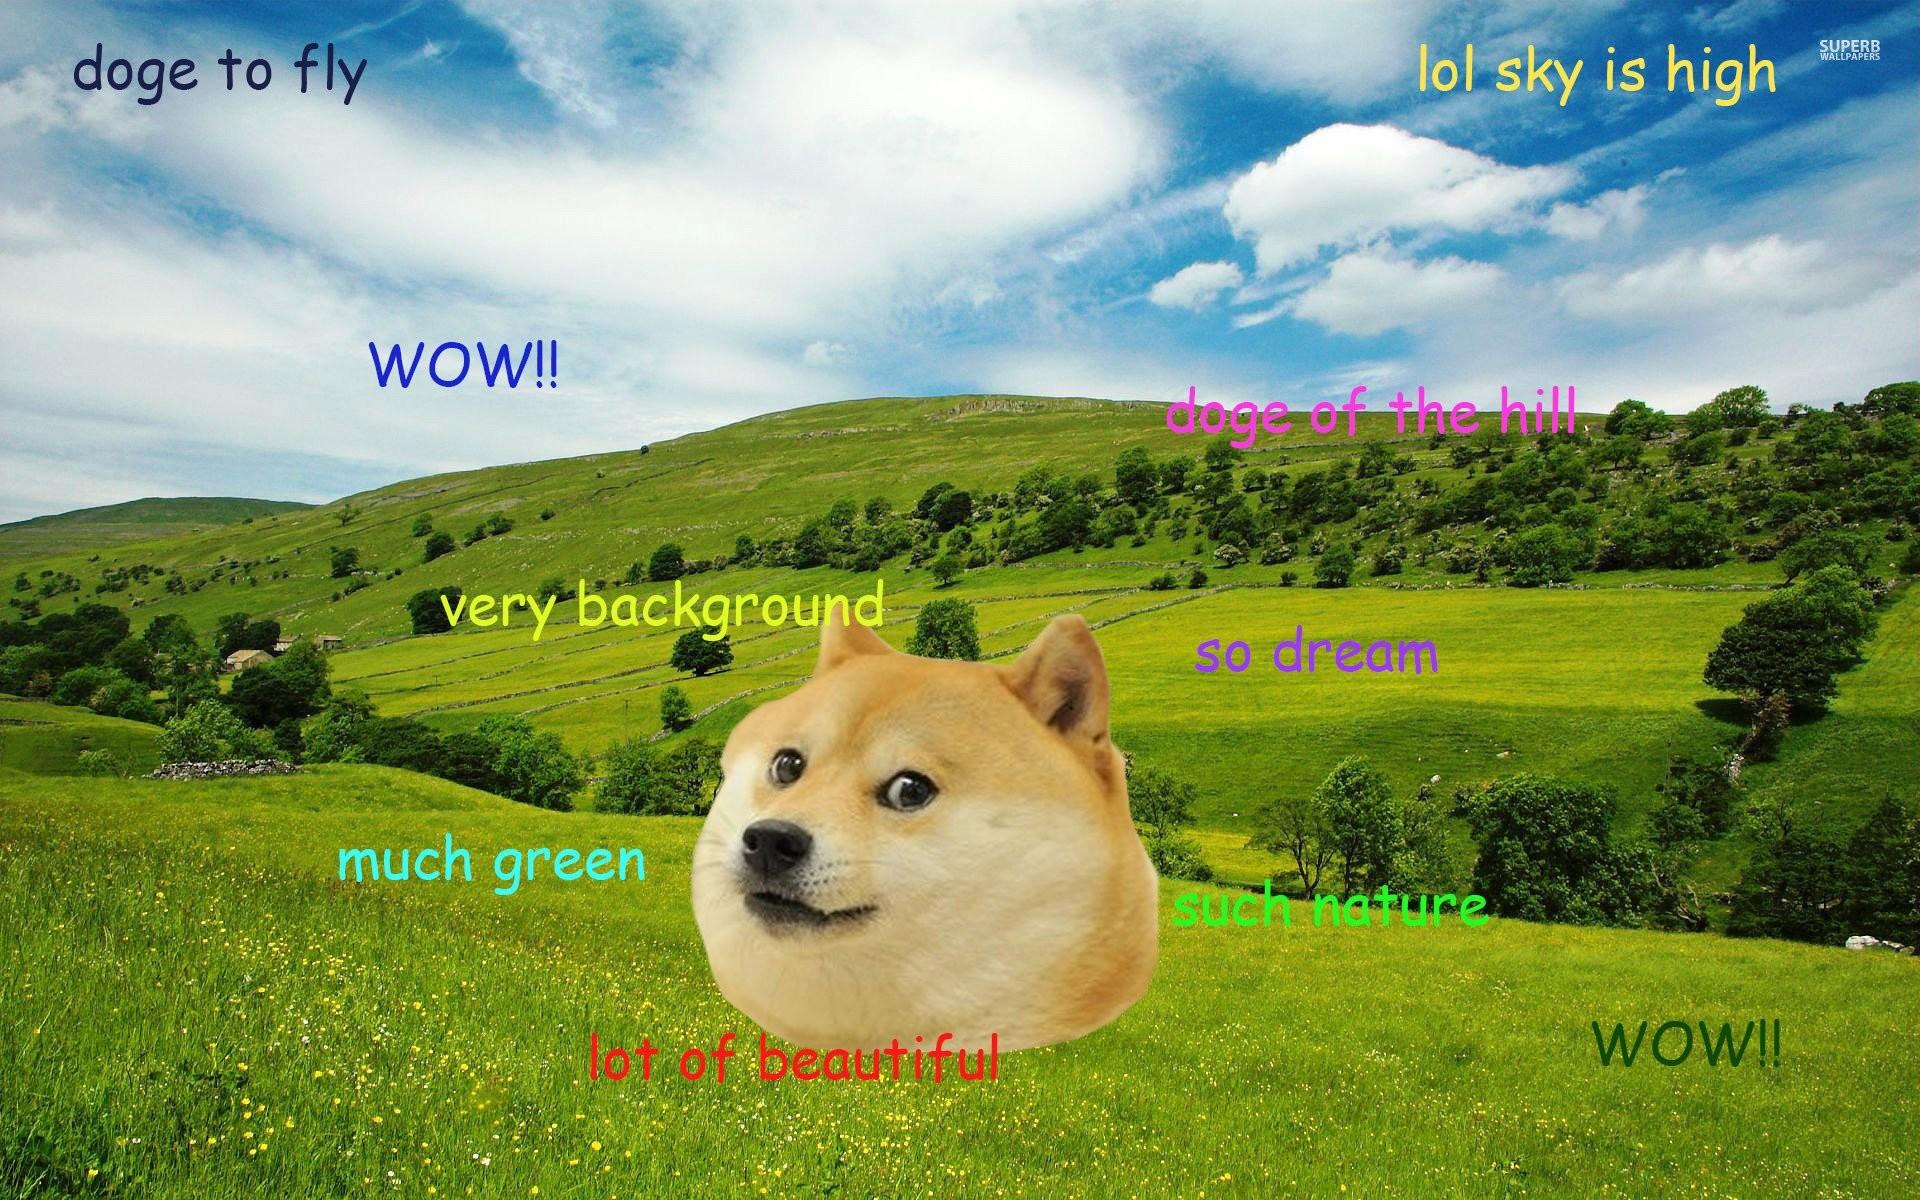 Doge 822446; doge 822436